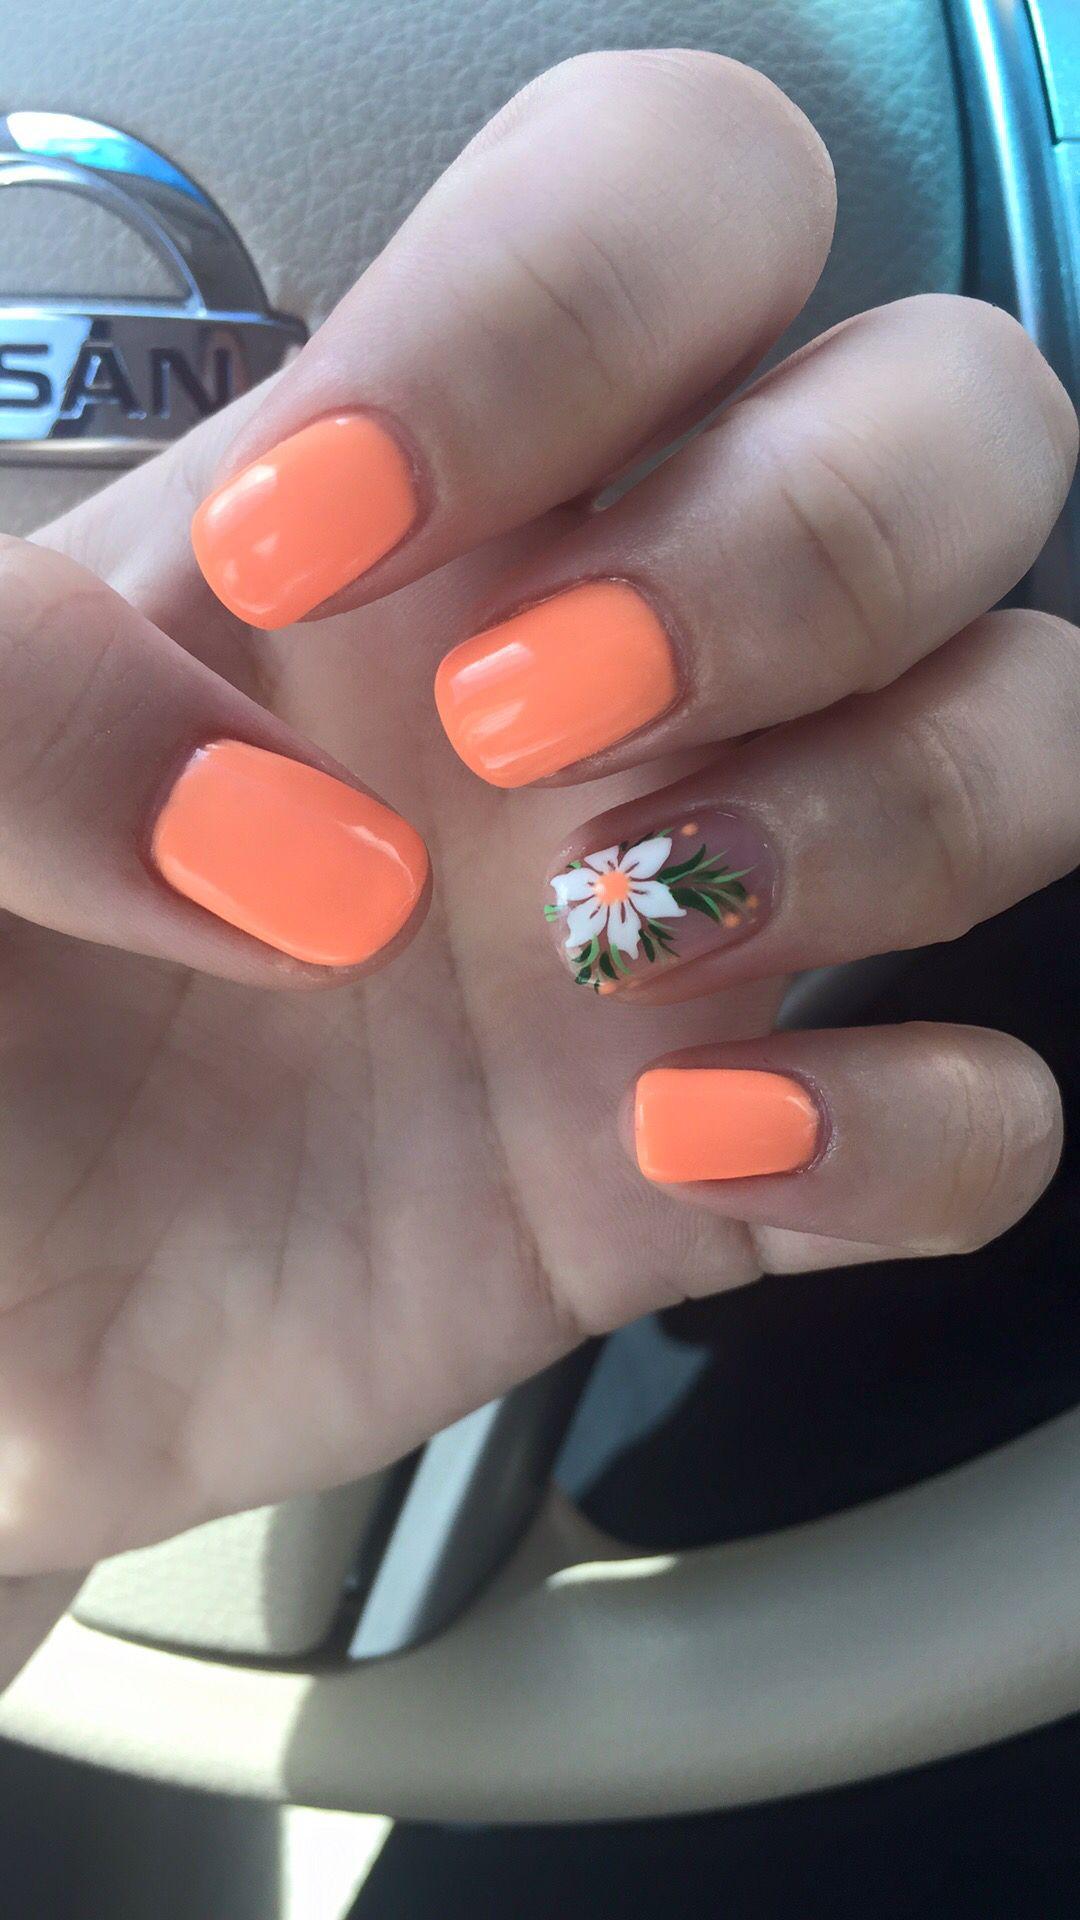 Summer Nails!! Painted with Gel Polish (Kiara Sky). I love my nails ...